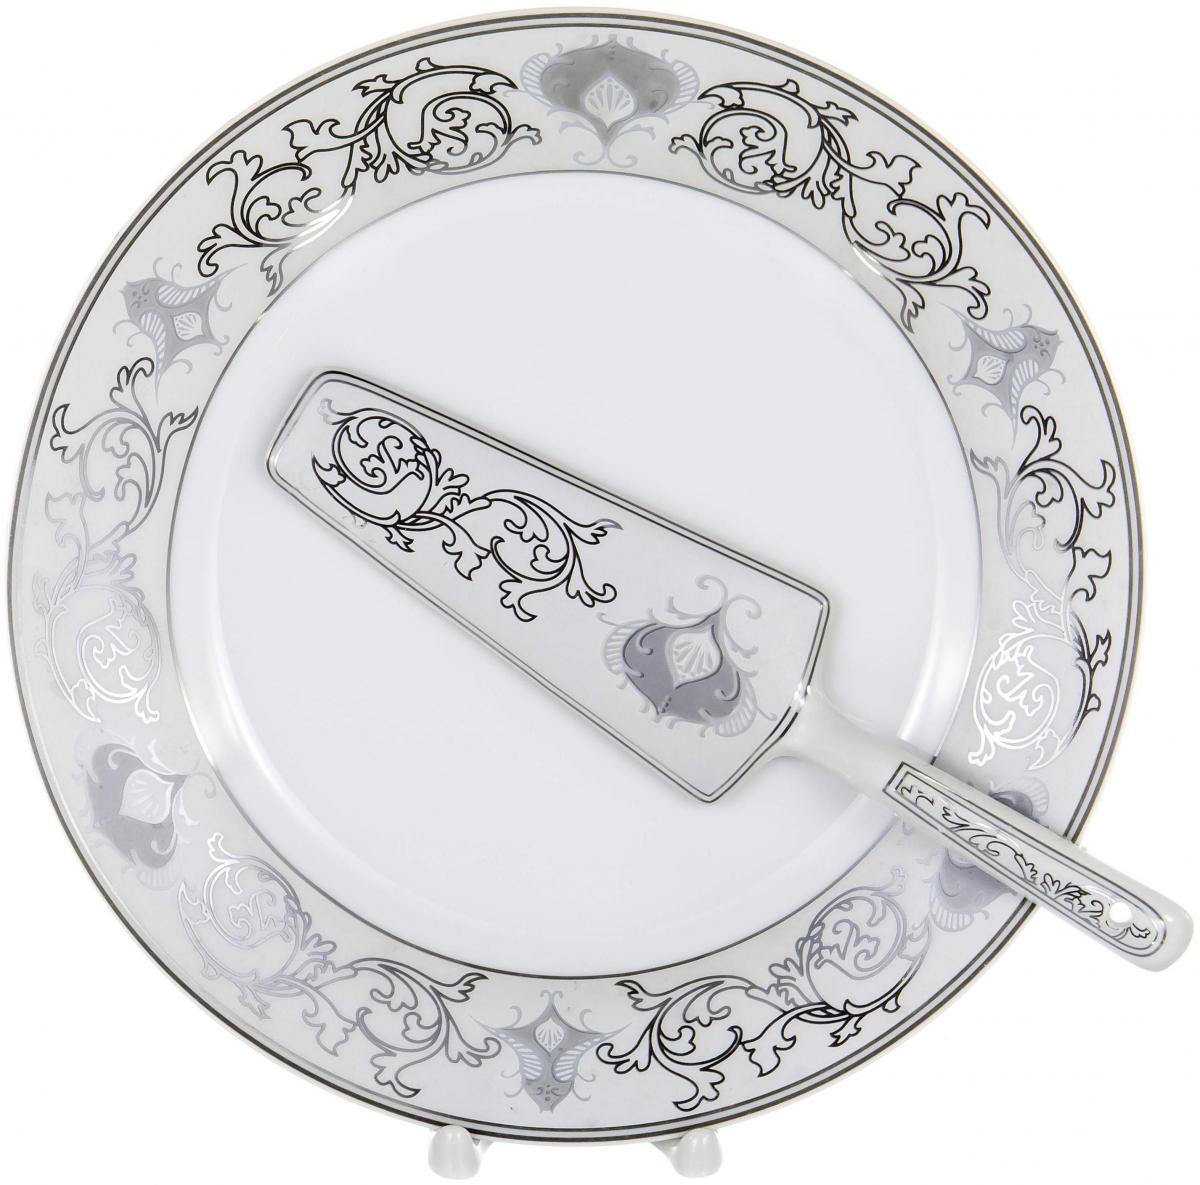 Набор для торта Olaff, 2 предмета. LRS-CPN2-012LRS-CPN2-012CAKE 2, набор д/торта (2) блюдо 255мм + лопатка, декор - золото-серебро, подарочная упаковка